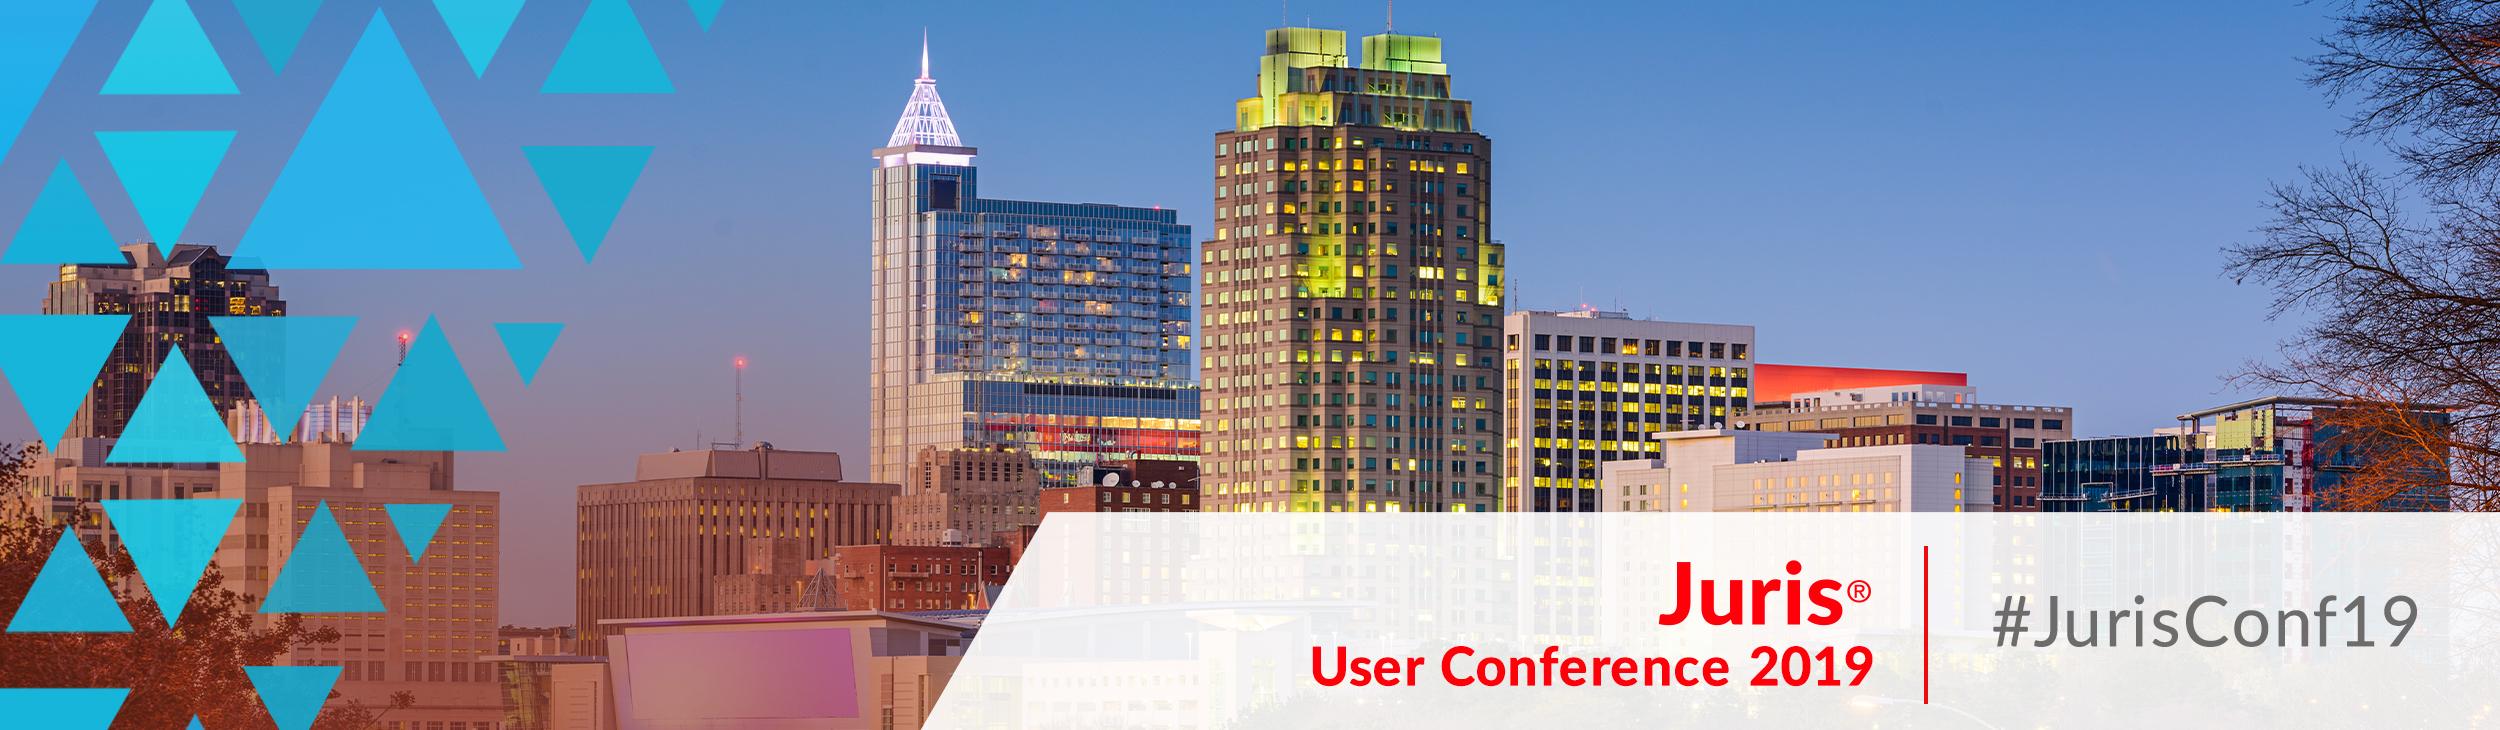 001450_Juris_User_Conference_2019_Website_header_postevent_2500x730